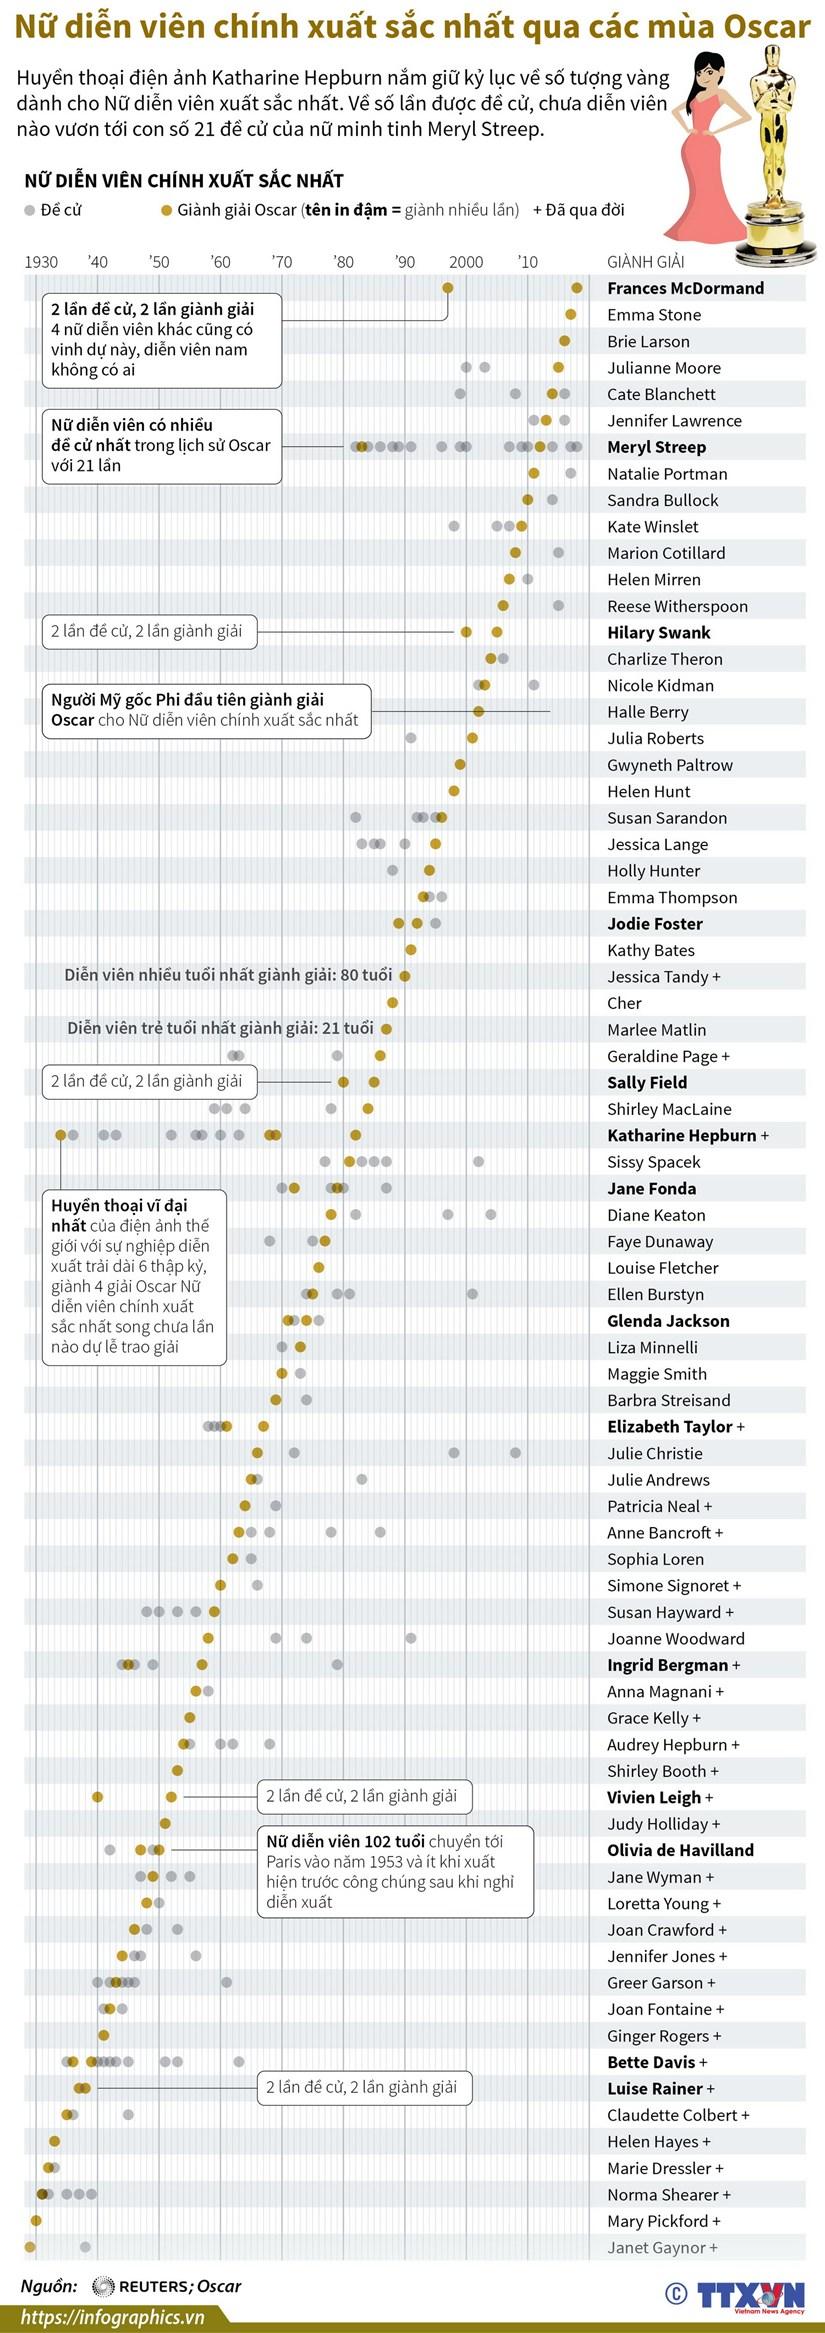 [Infographics] Nu dien vien chinh xuat sac nhat qua cac mua Oscar hinh anh 1